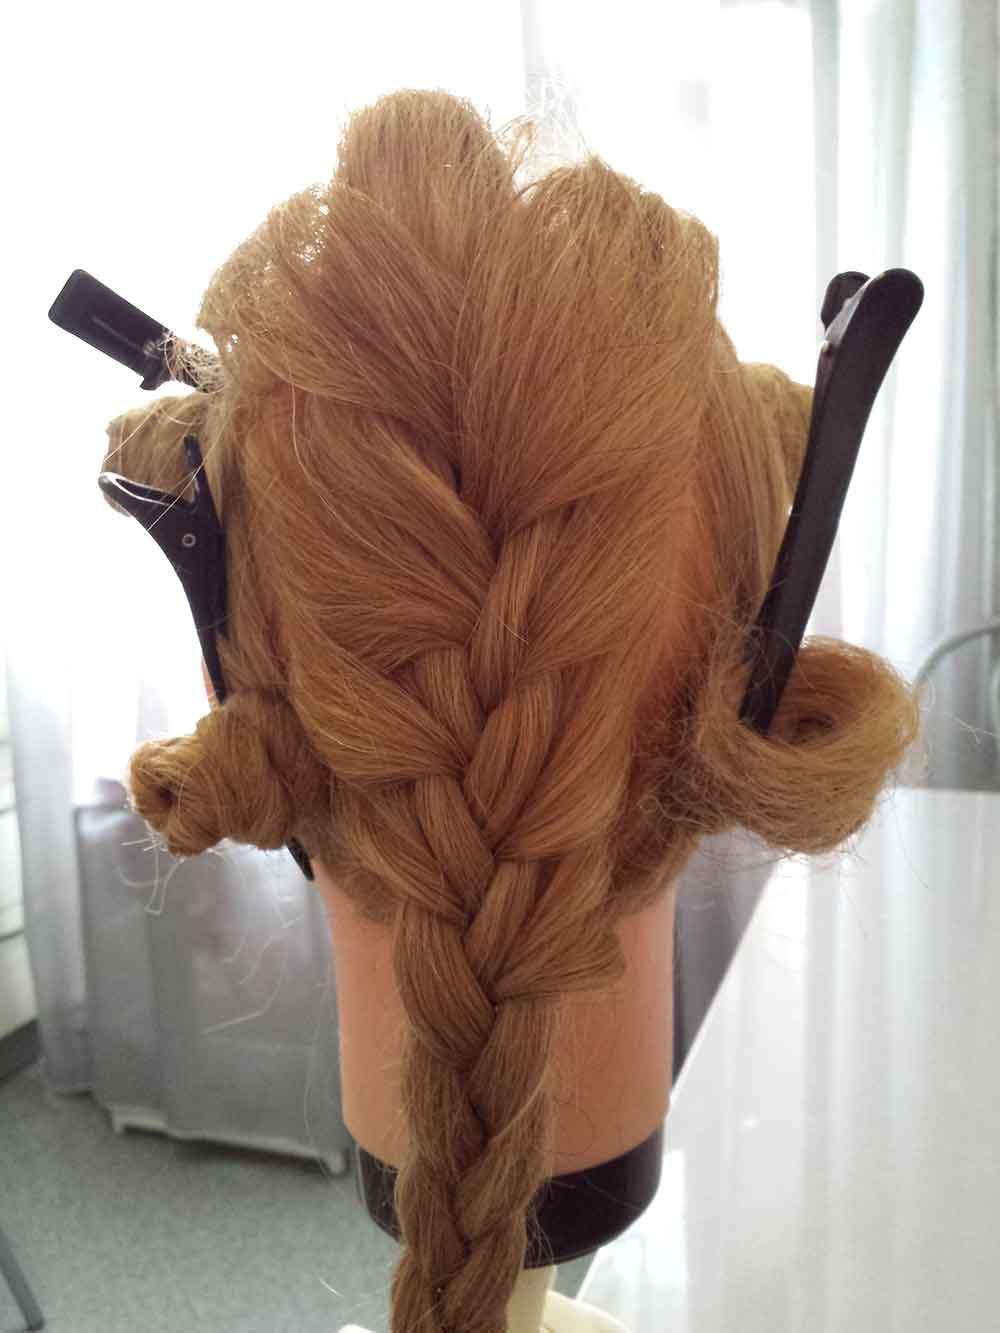 Заплетенная коса